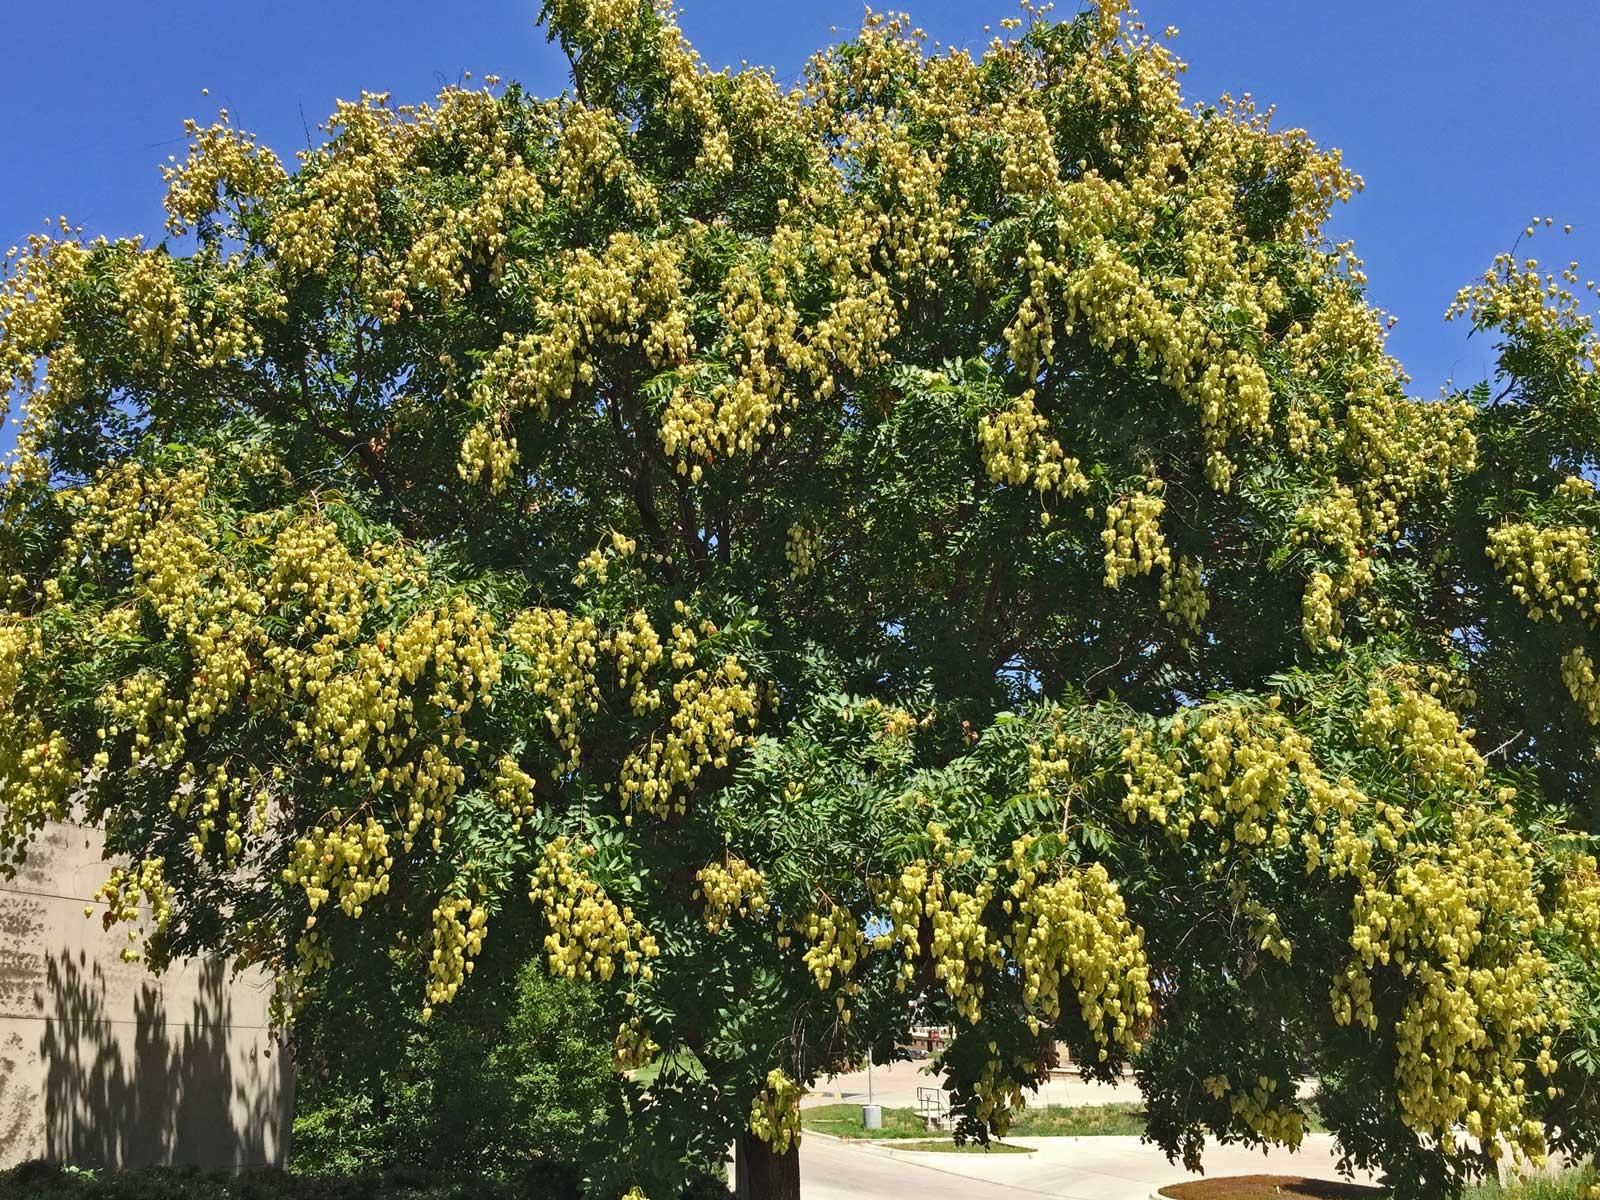 Golden Rain Tree has bright yellow, paper-like capsule blooms in summer.